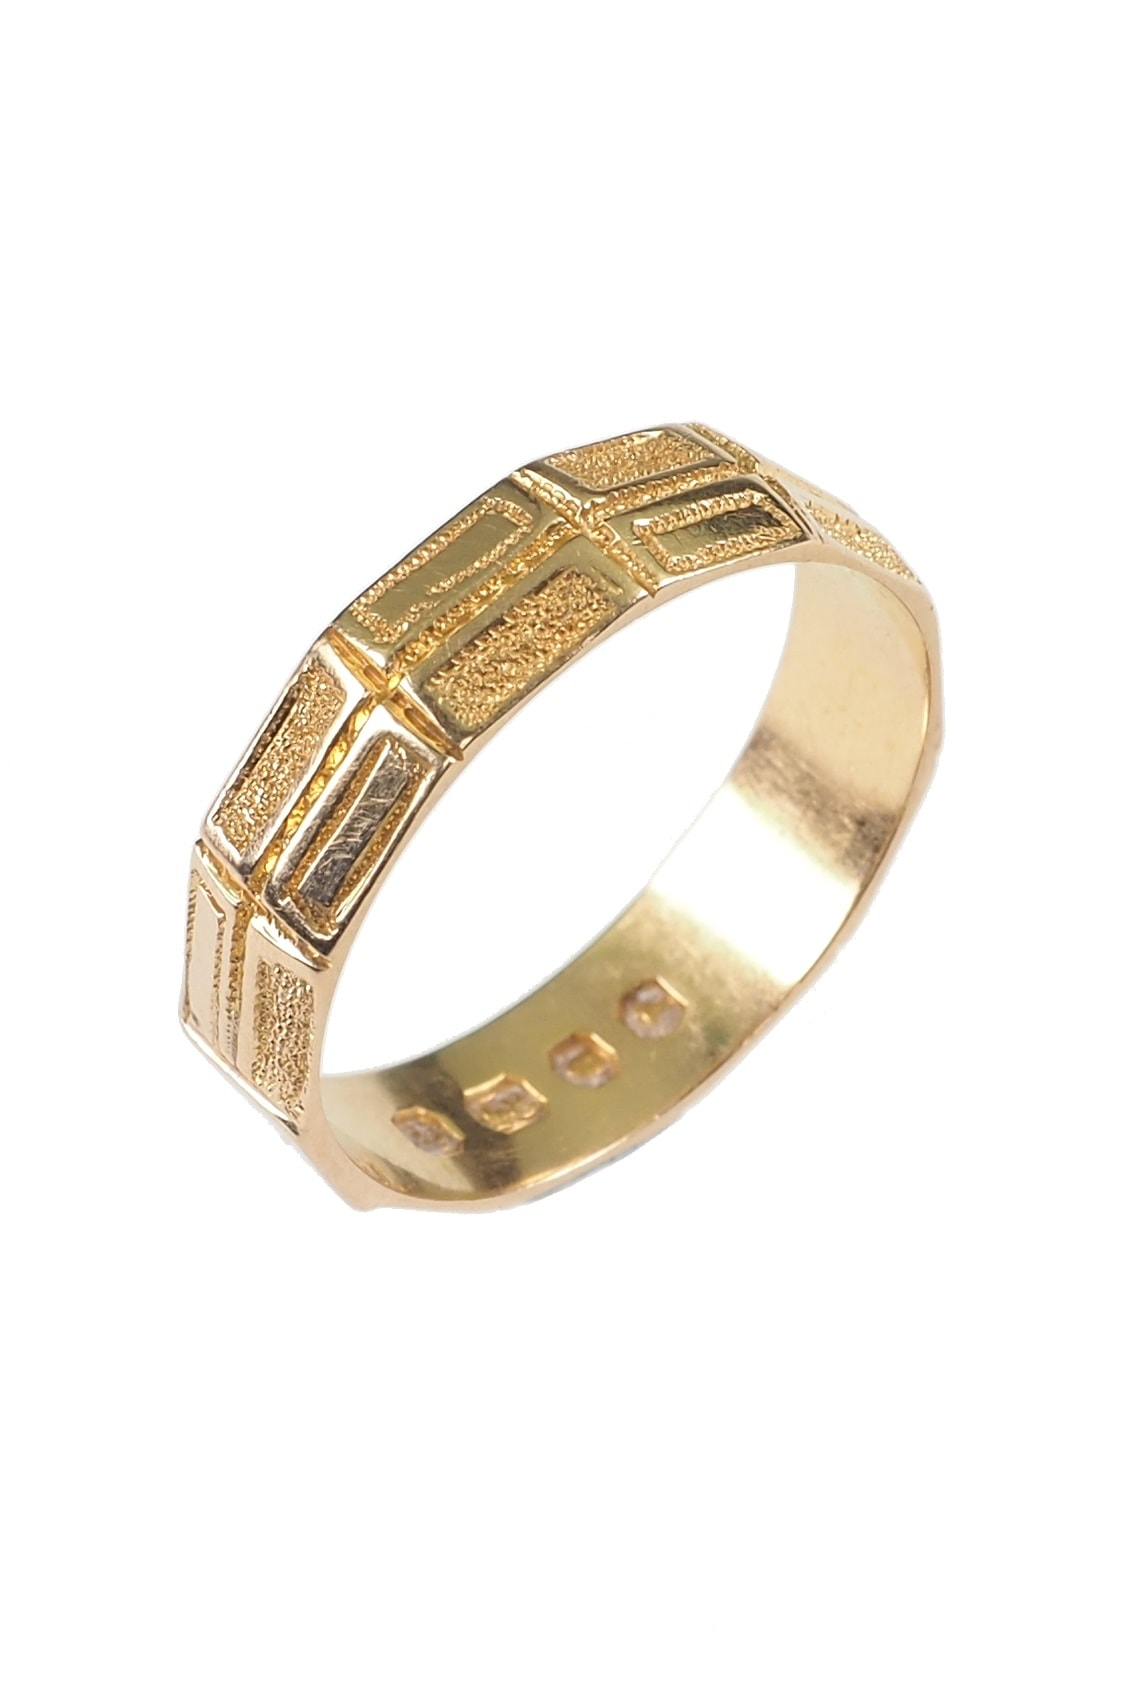 antike-Goldeheringe-kaufen-2290a